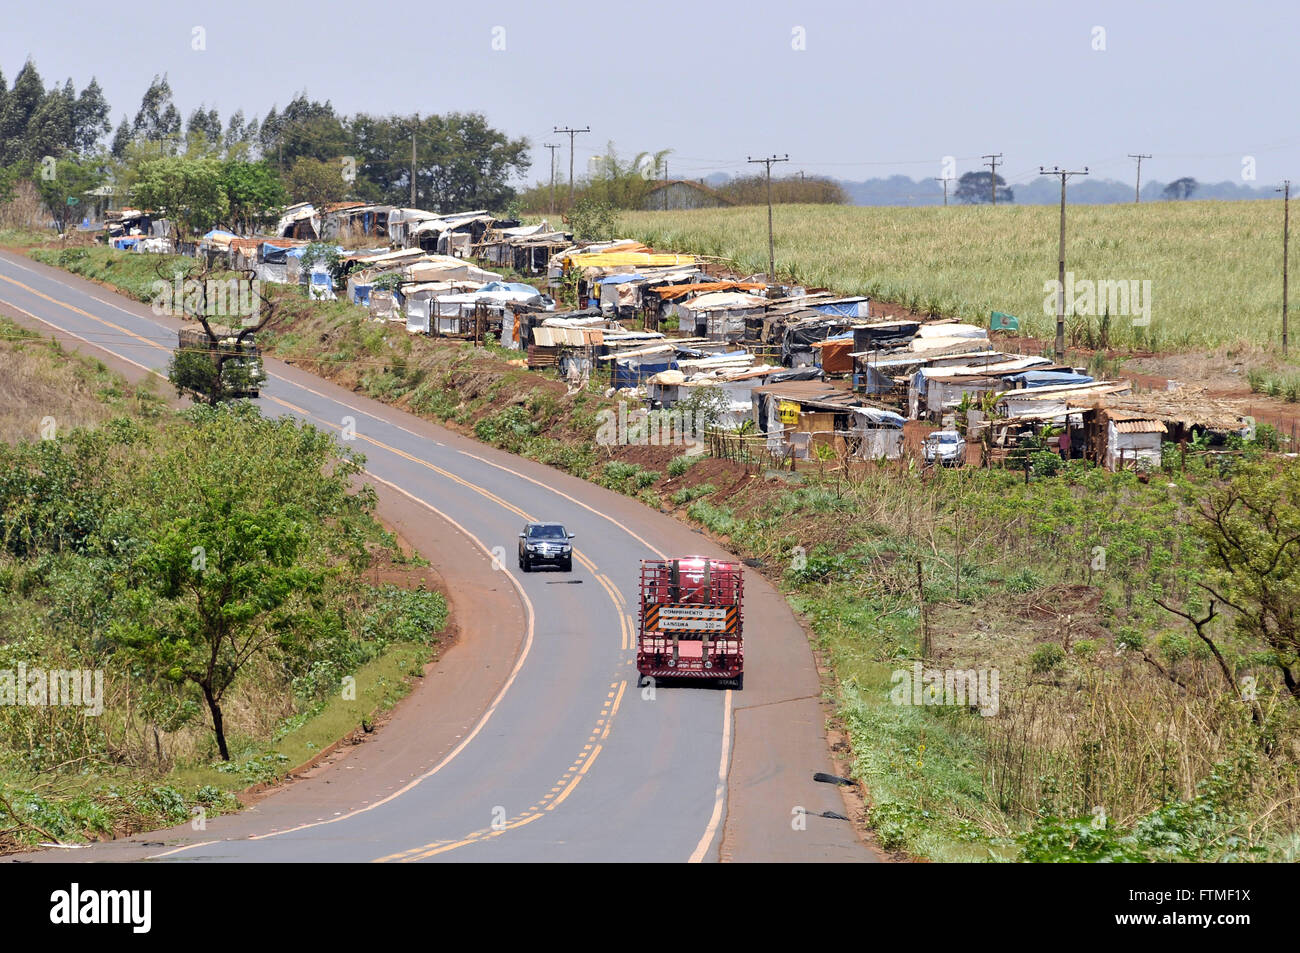 Landless settlements margins of BR-452 highway - Stock Image